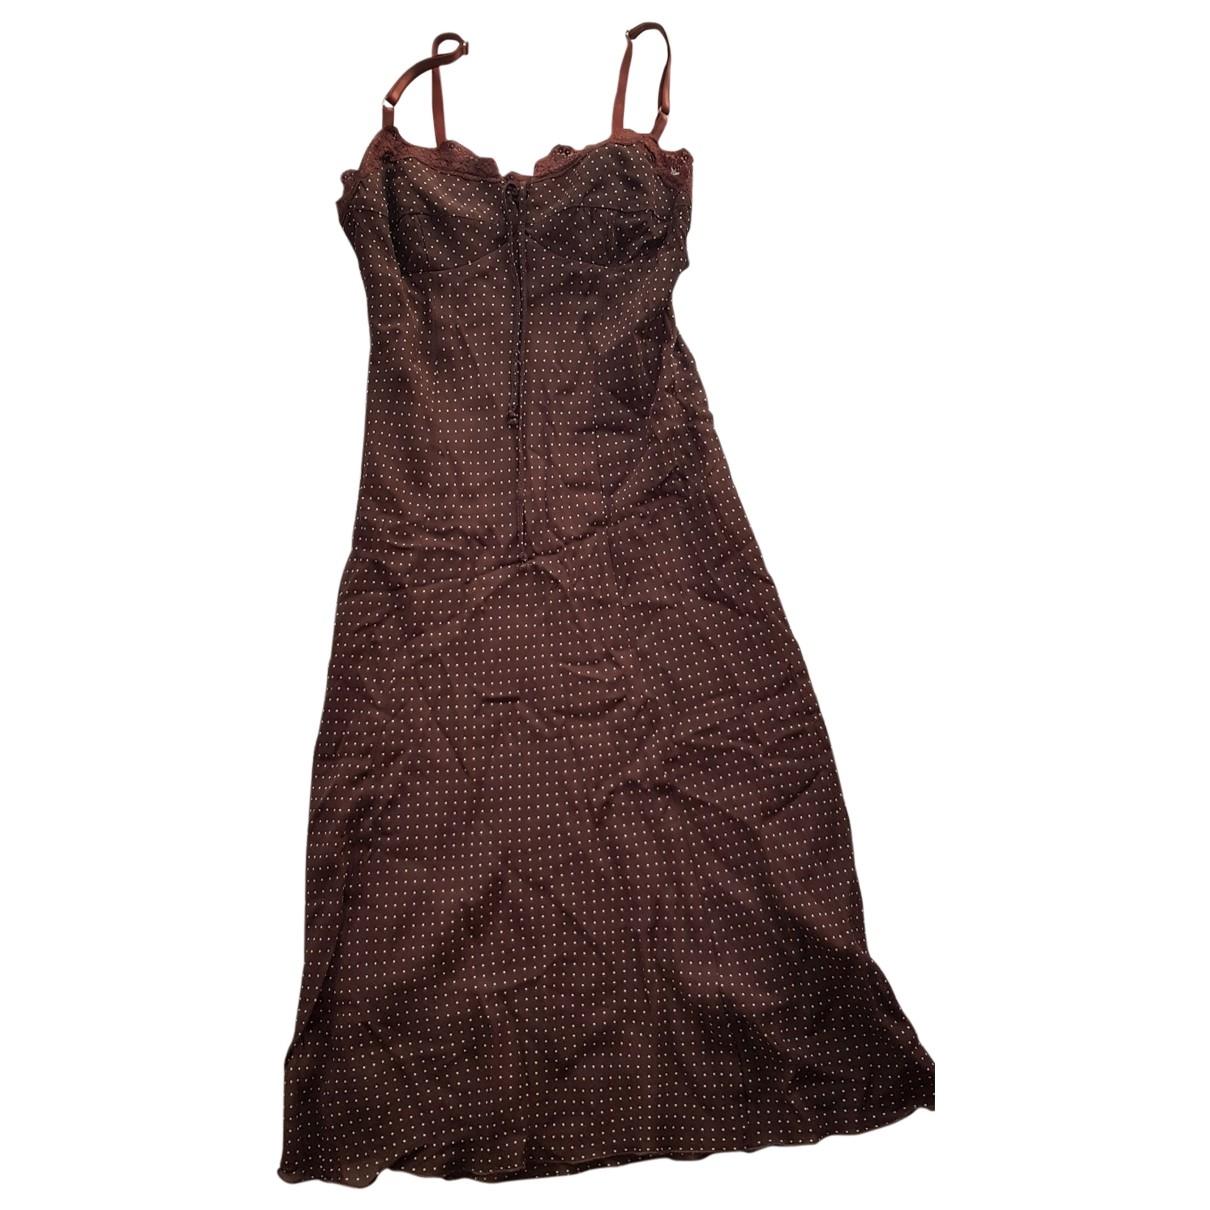 - Robe Hippie Chic pour femme - marron